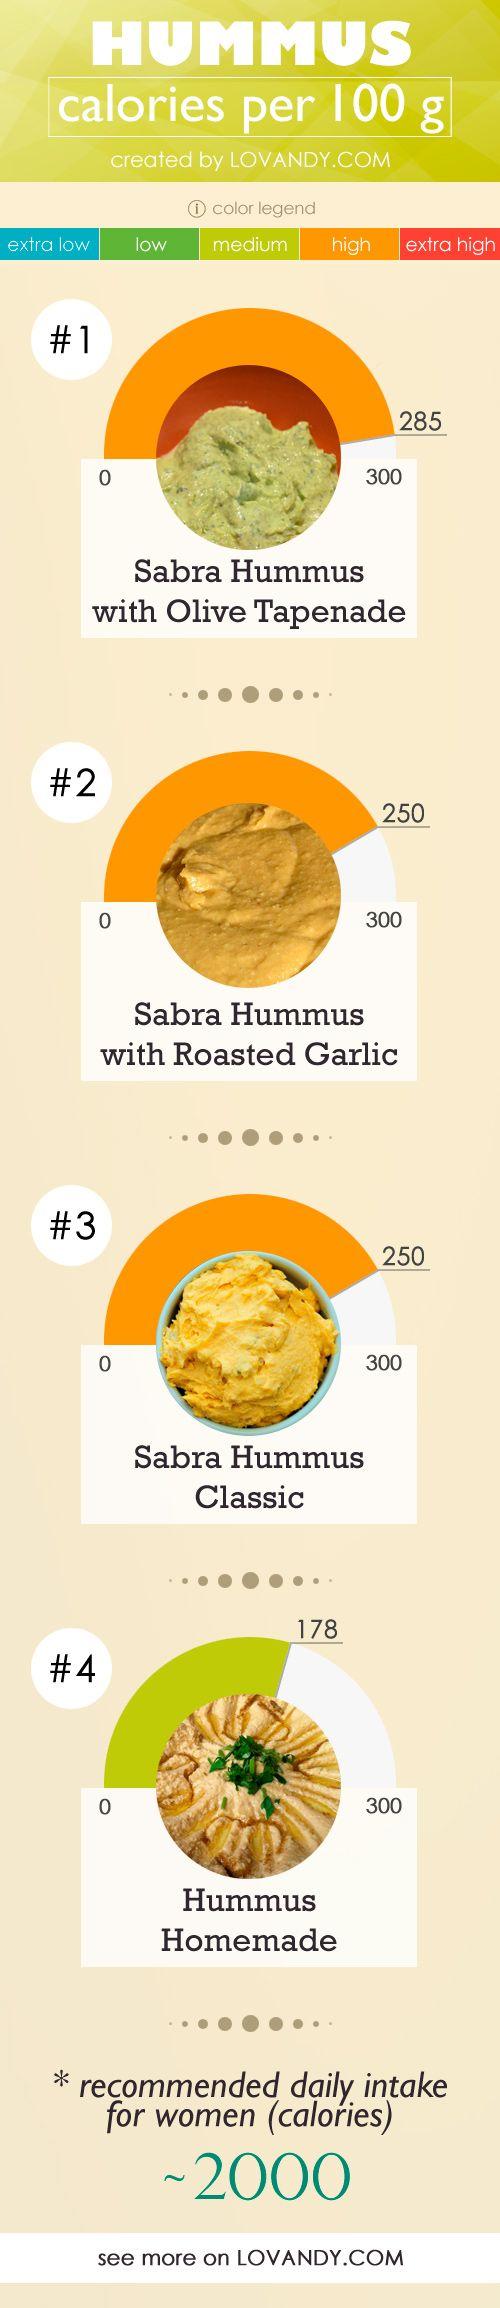 Calories chart for hummus (per 100 g)